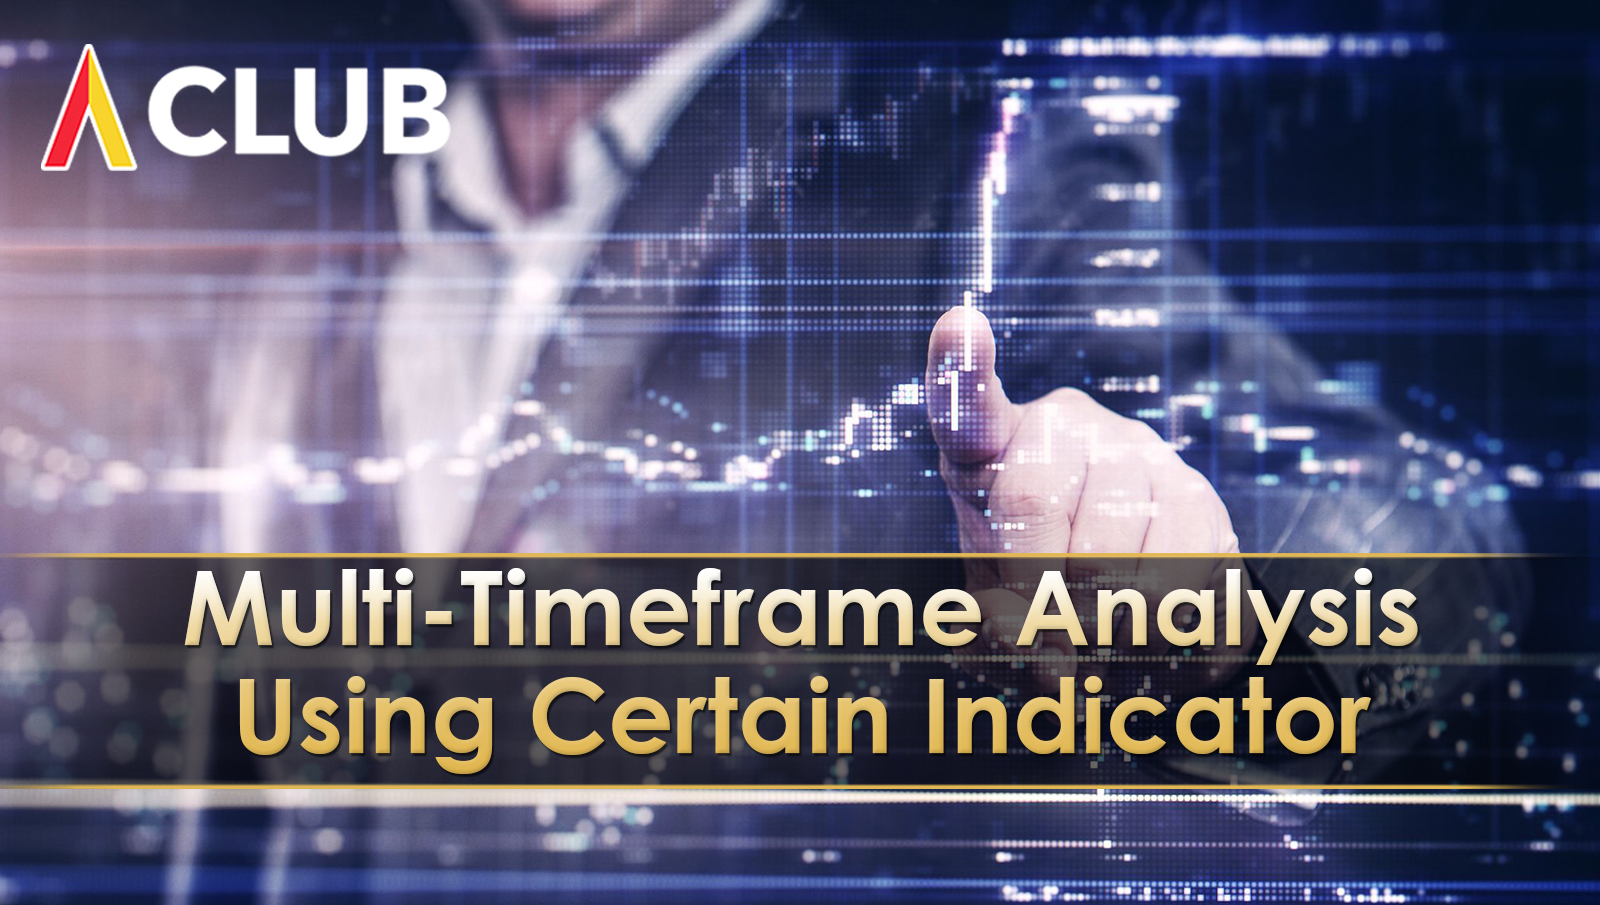 MULTI-TIMEFRAME ANALYSIS USING CERTAIN INDICATOR